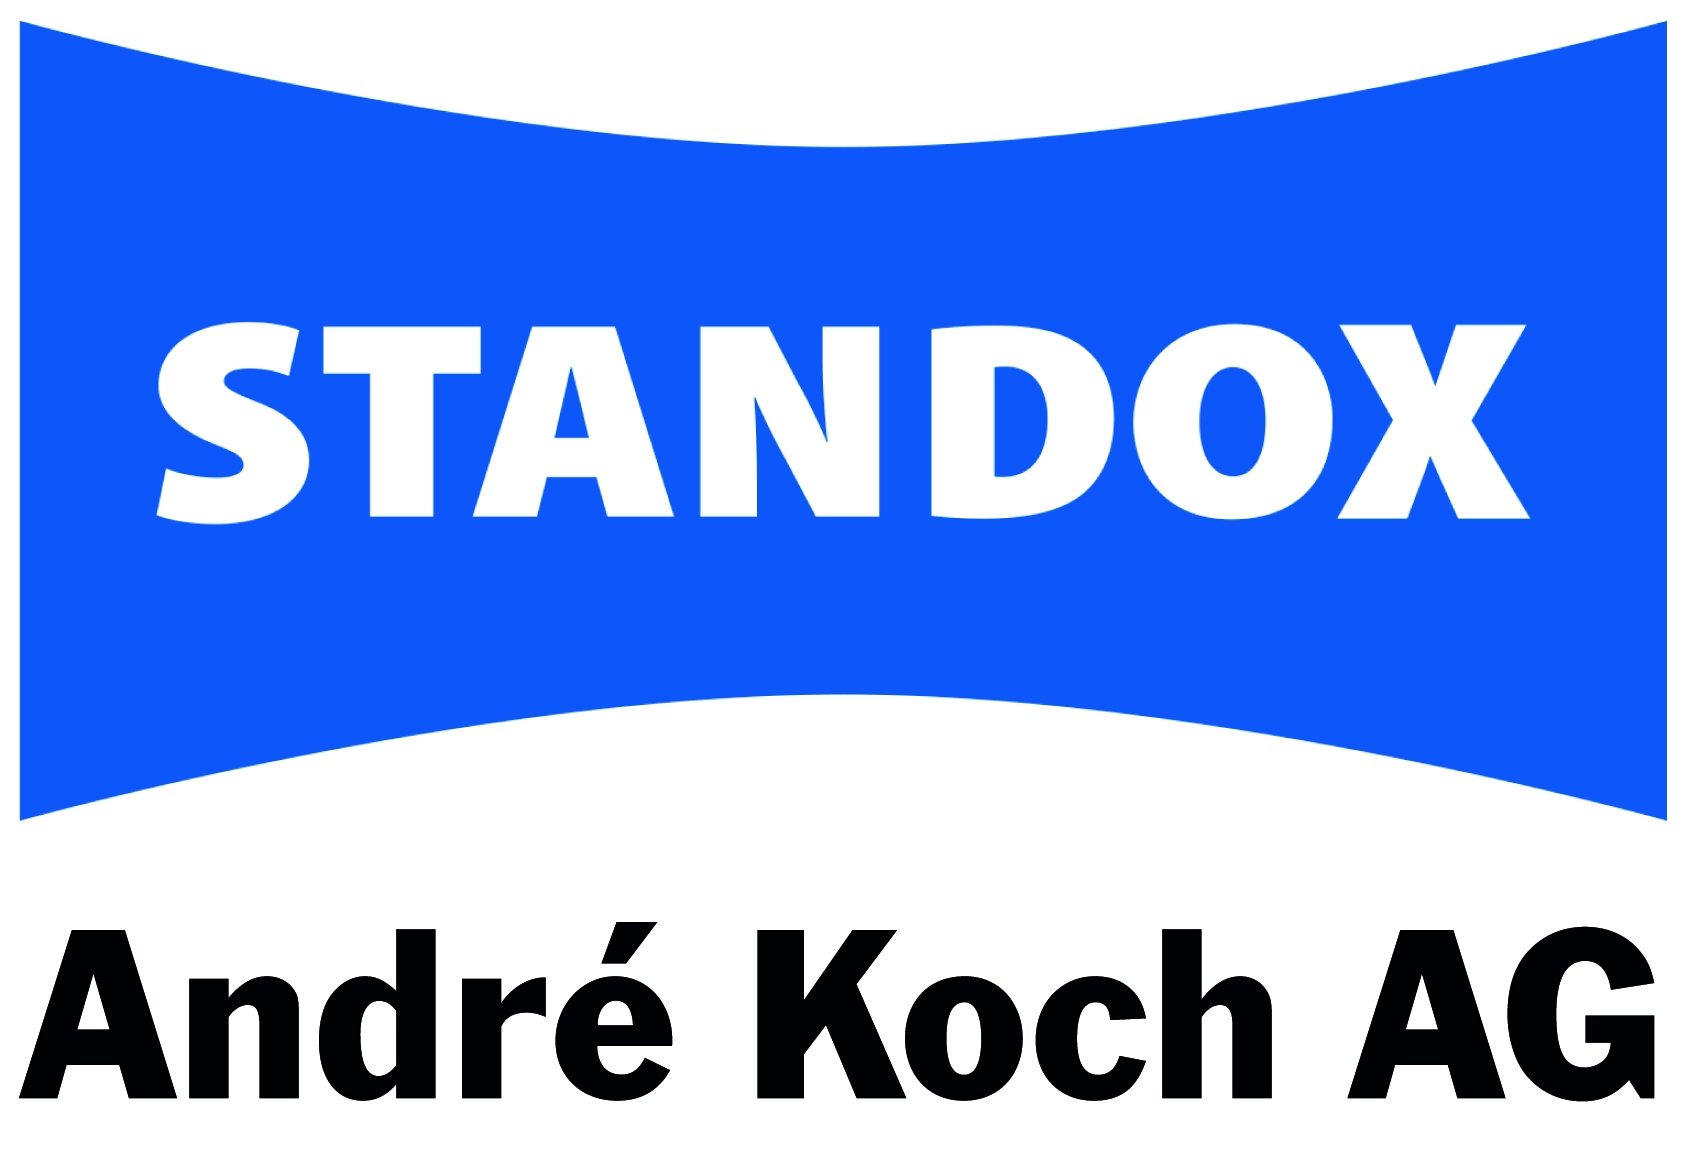 Standox+André Koch_kombiniert